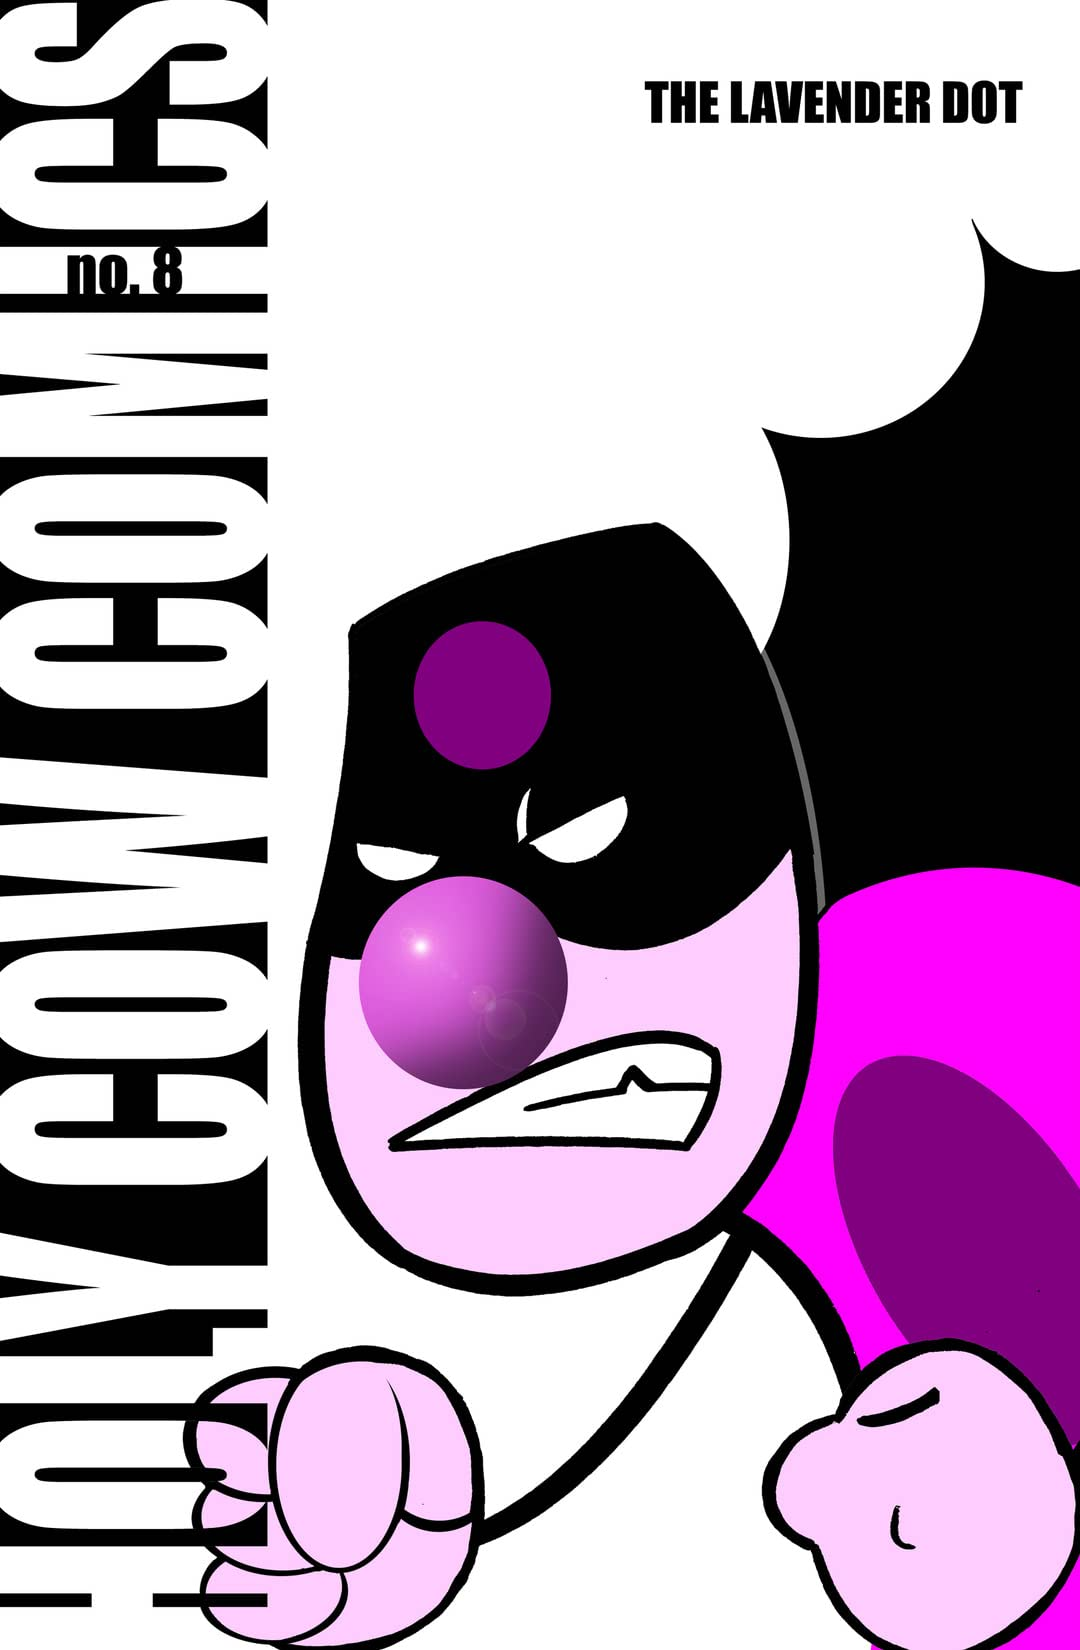 Holy Cow Comics #8